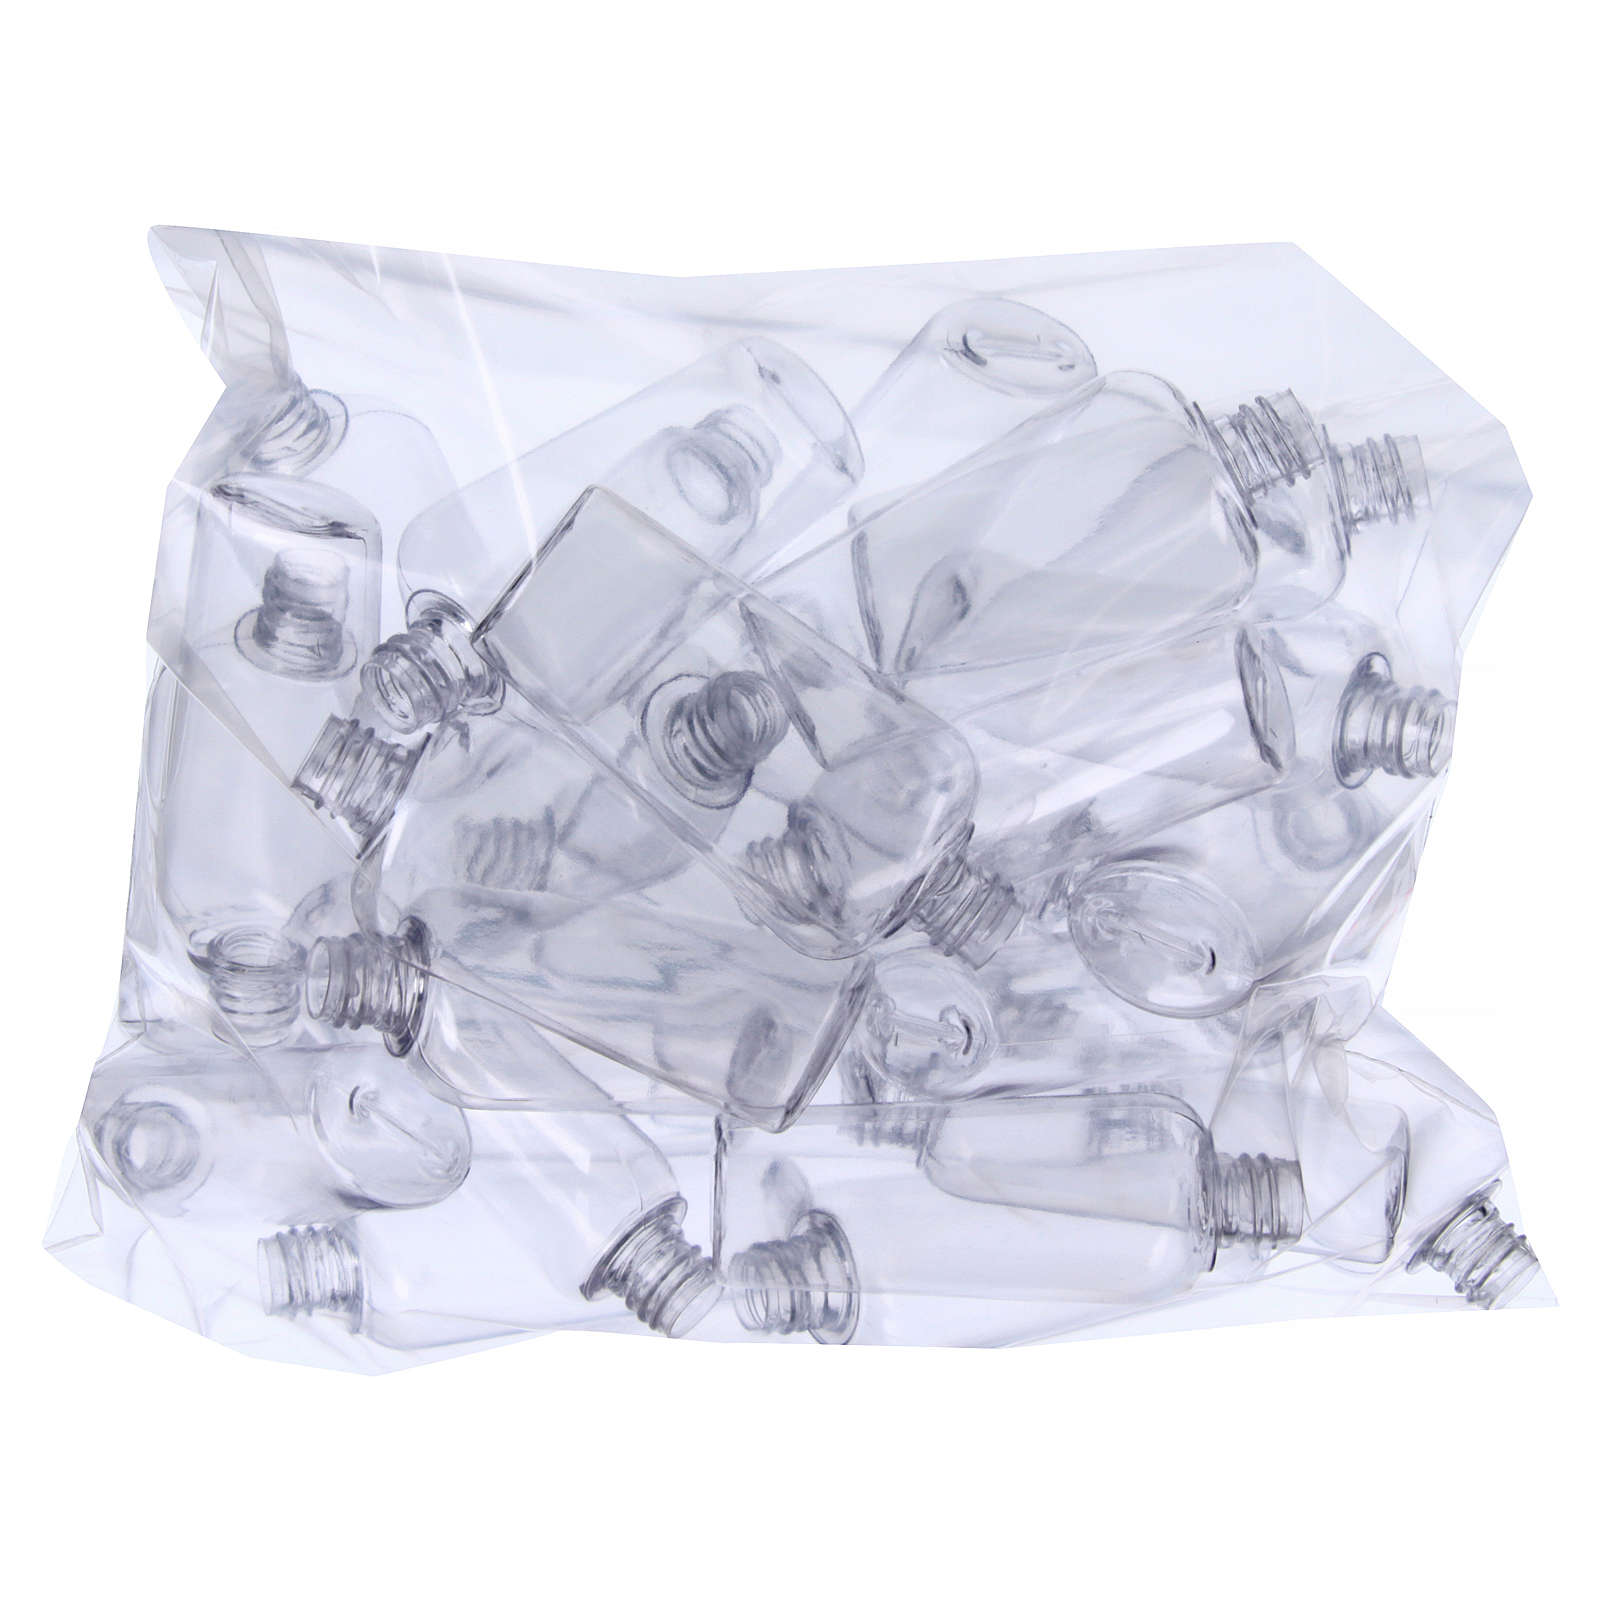 Bottigliette acquasanta 75 ml conf. 100 pz 3